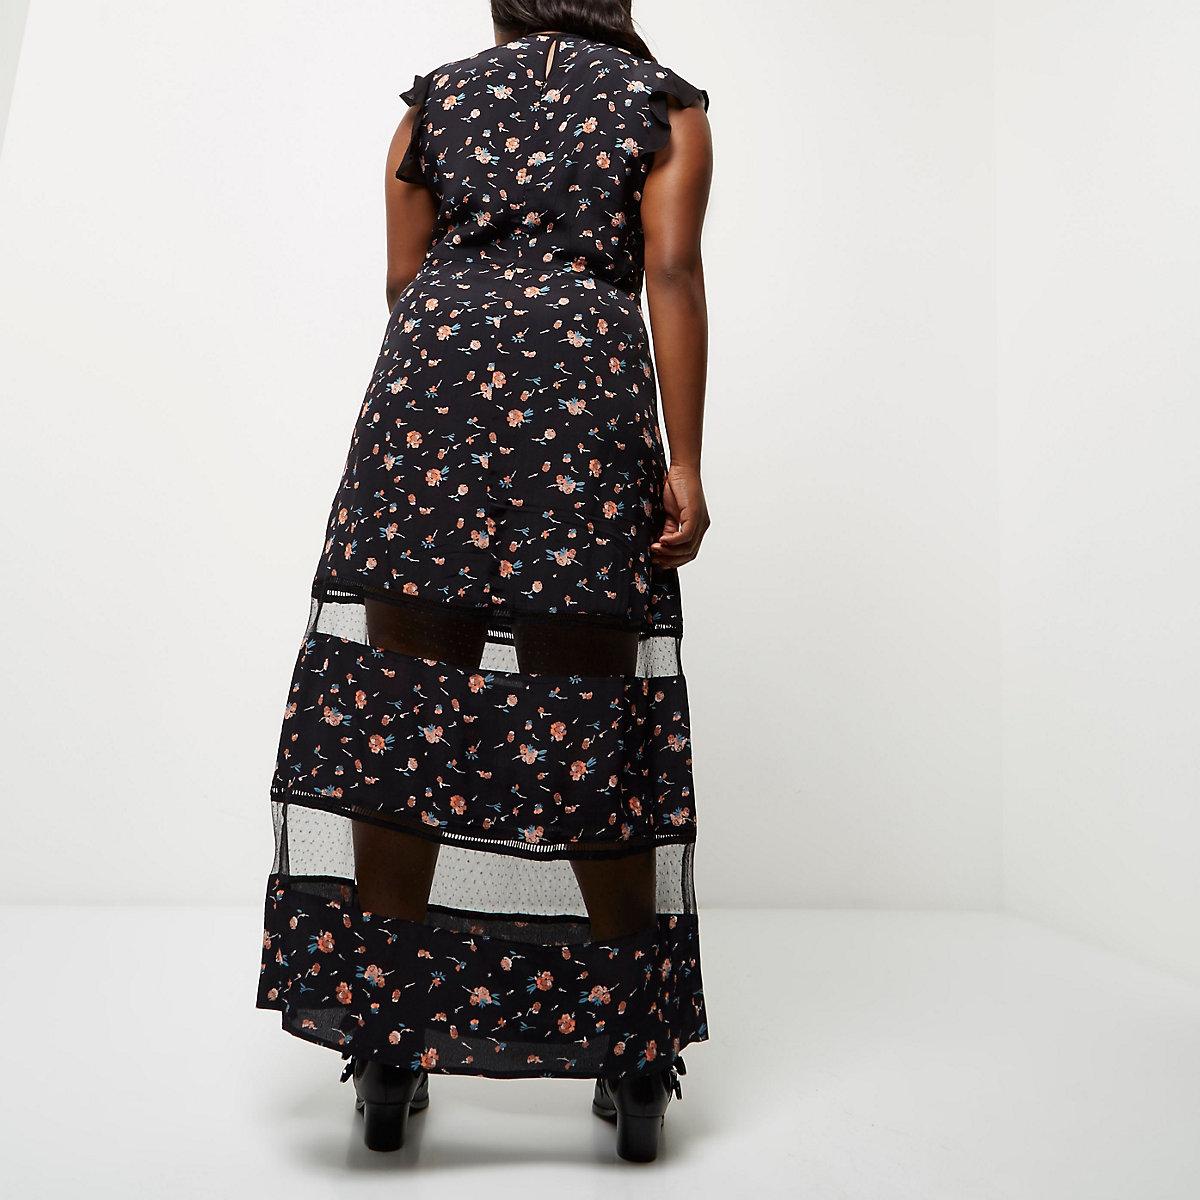 huge discount 254ae f3c14 Plus black floral print sheer panel dress